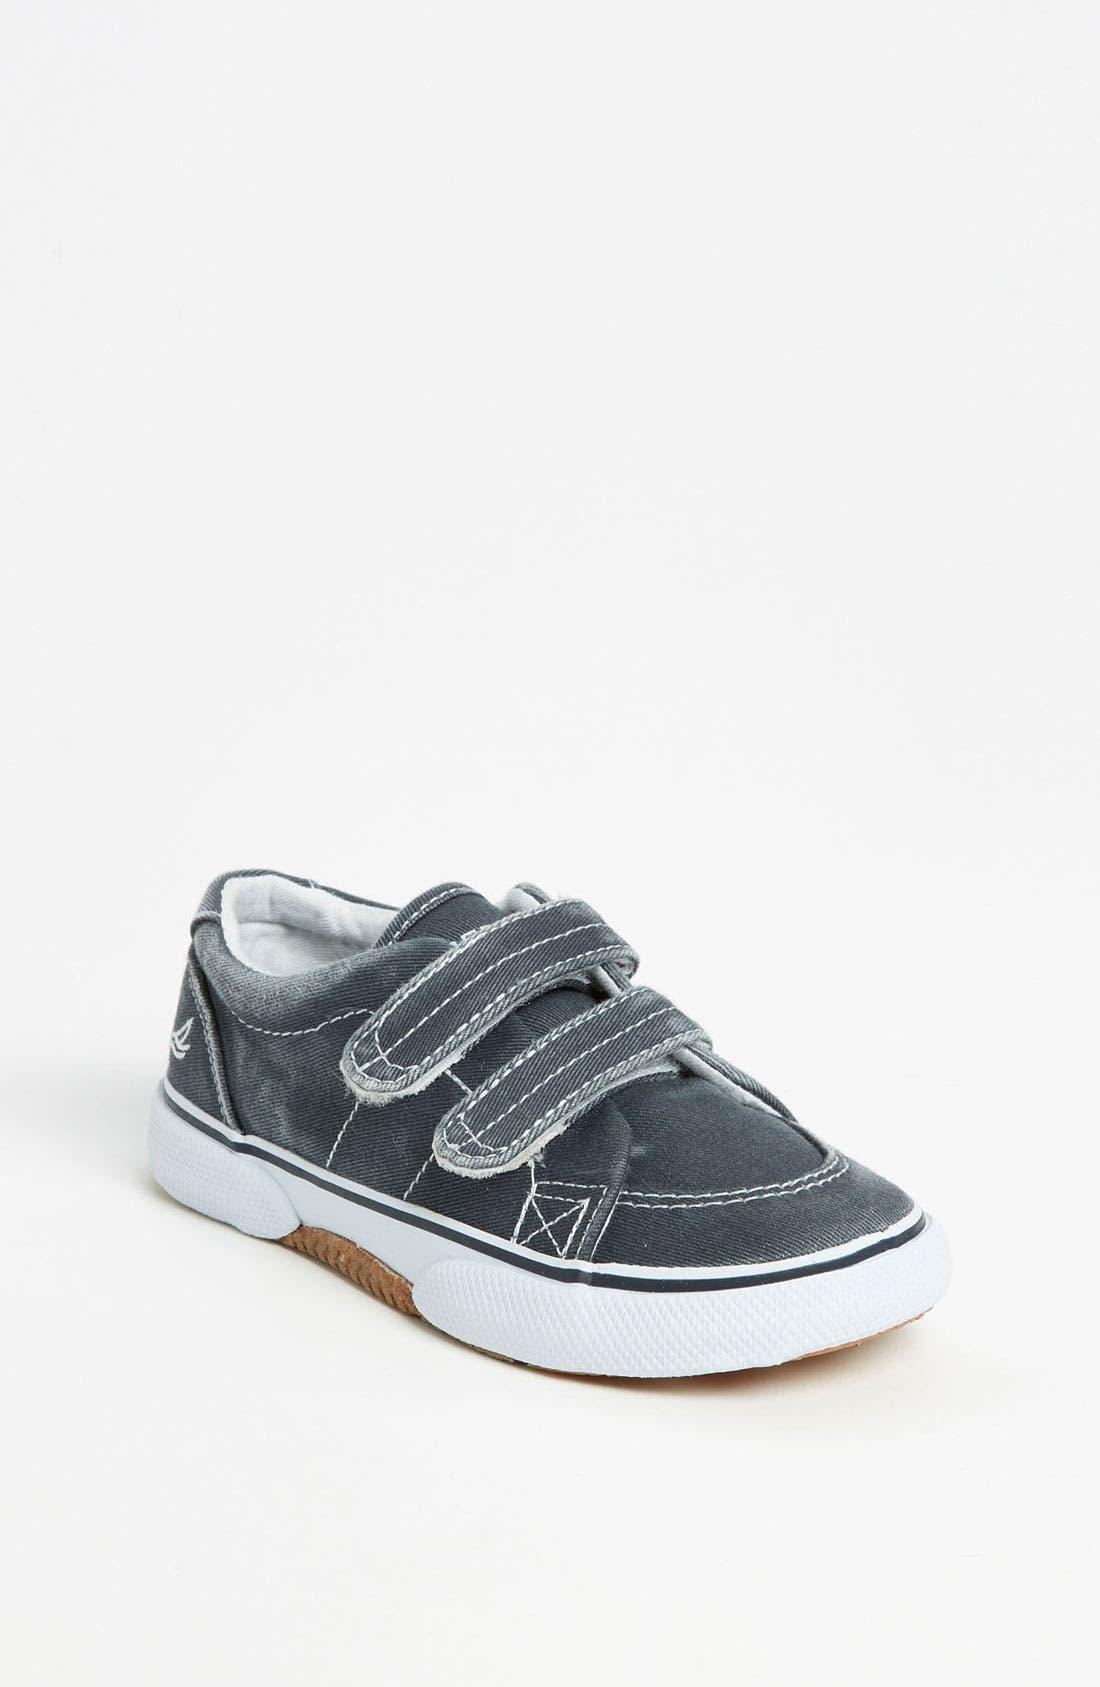 Main Image - Sperry Top-Sider® Kids 'Halyard' Sneaker (Walker & Toddler)